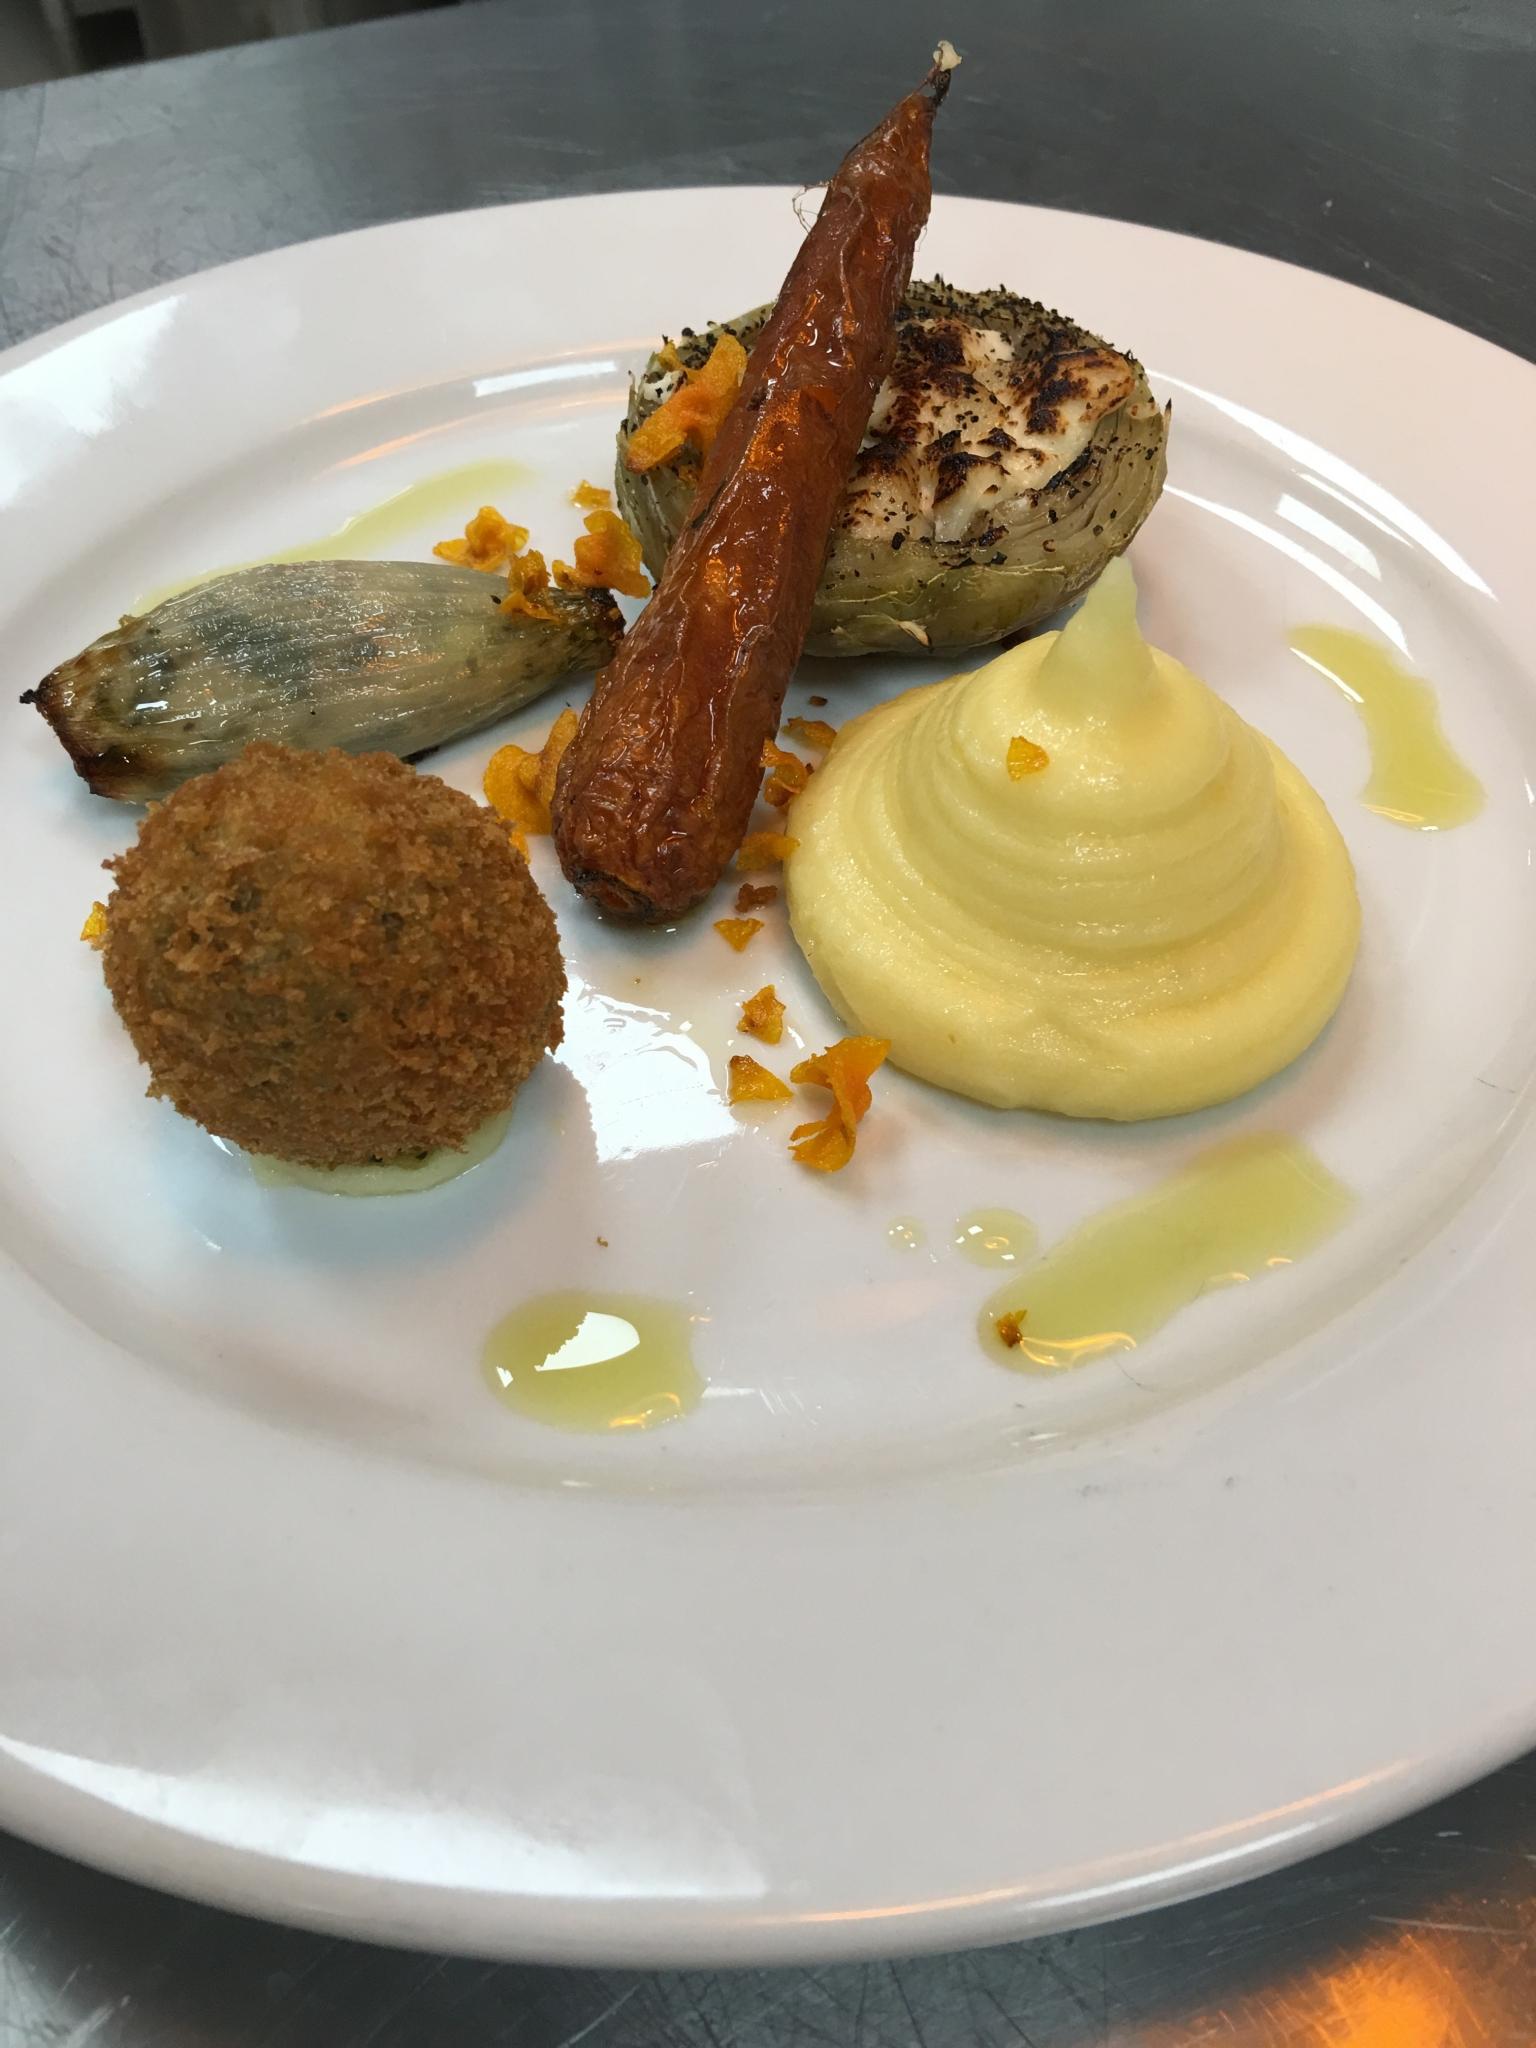 Onion, artichoke, and quales egg